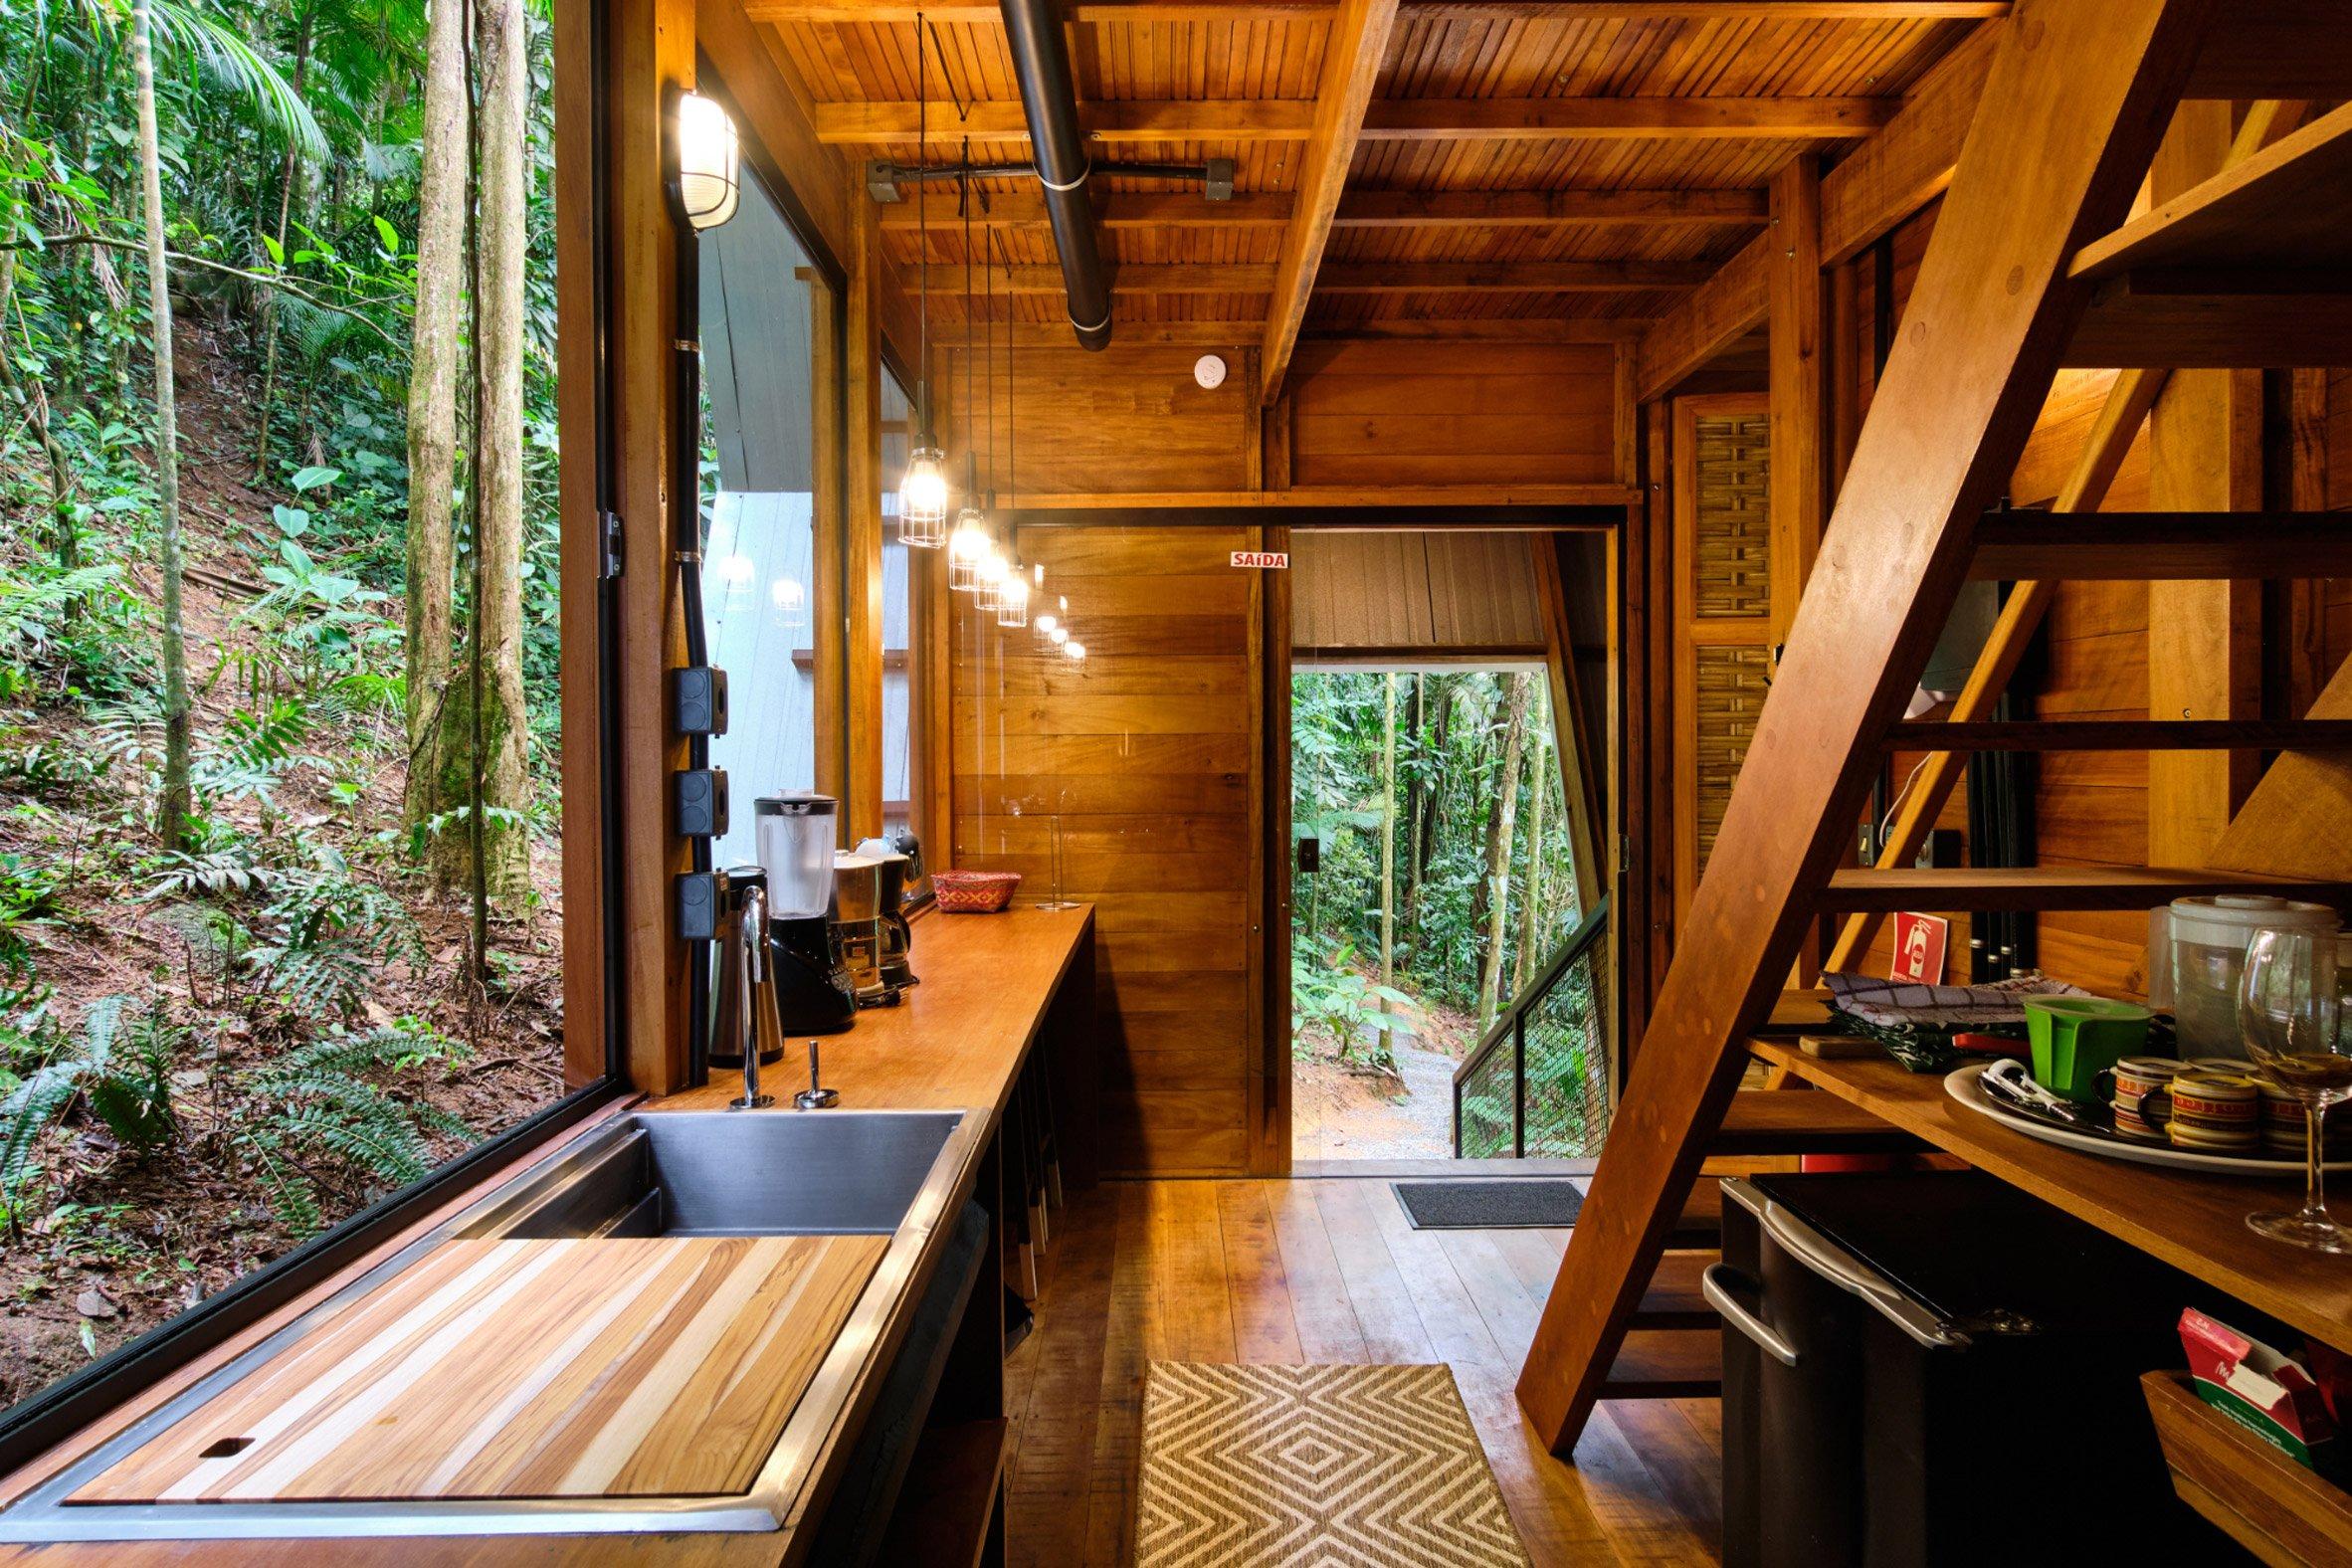 Kitchen of Monkey House by Atelier Marko Brajovic